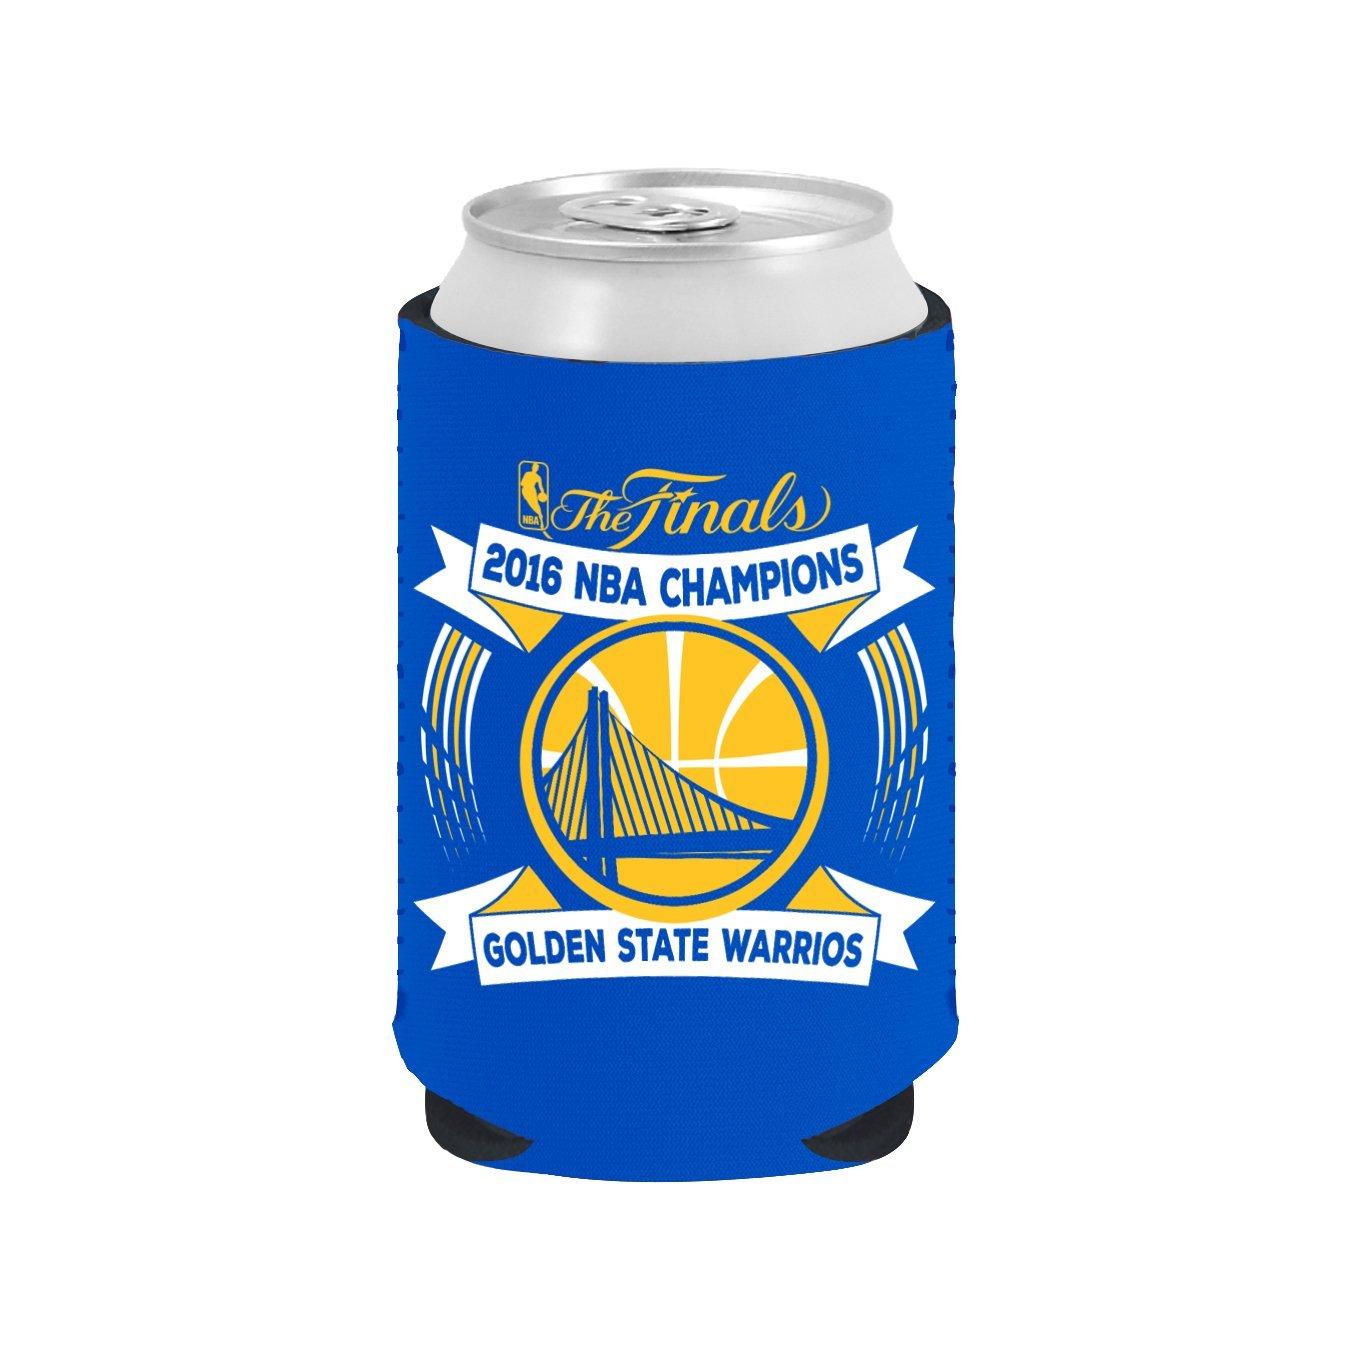 NBA Golden State Warriors 2016 Champions Kolder Kaddy Can, 350ml, Blue   B01GJ992KE